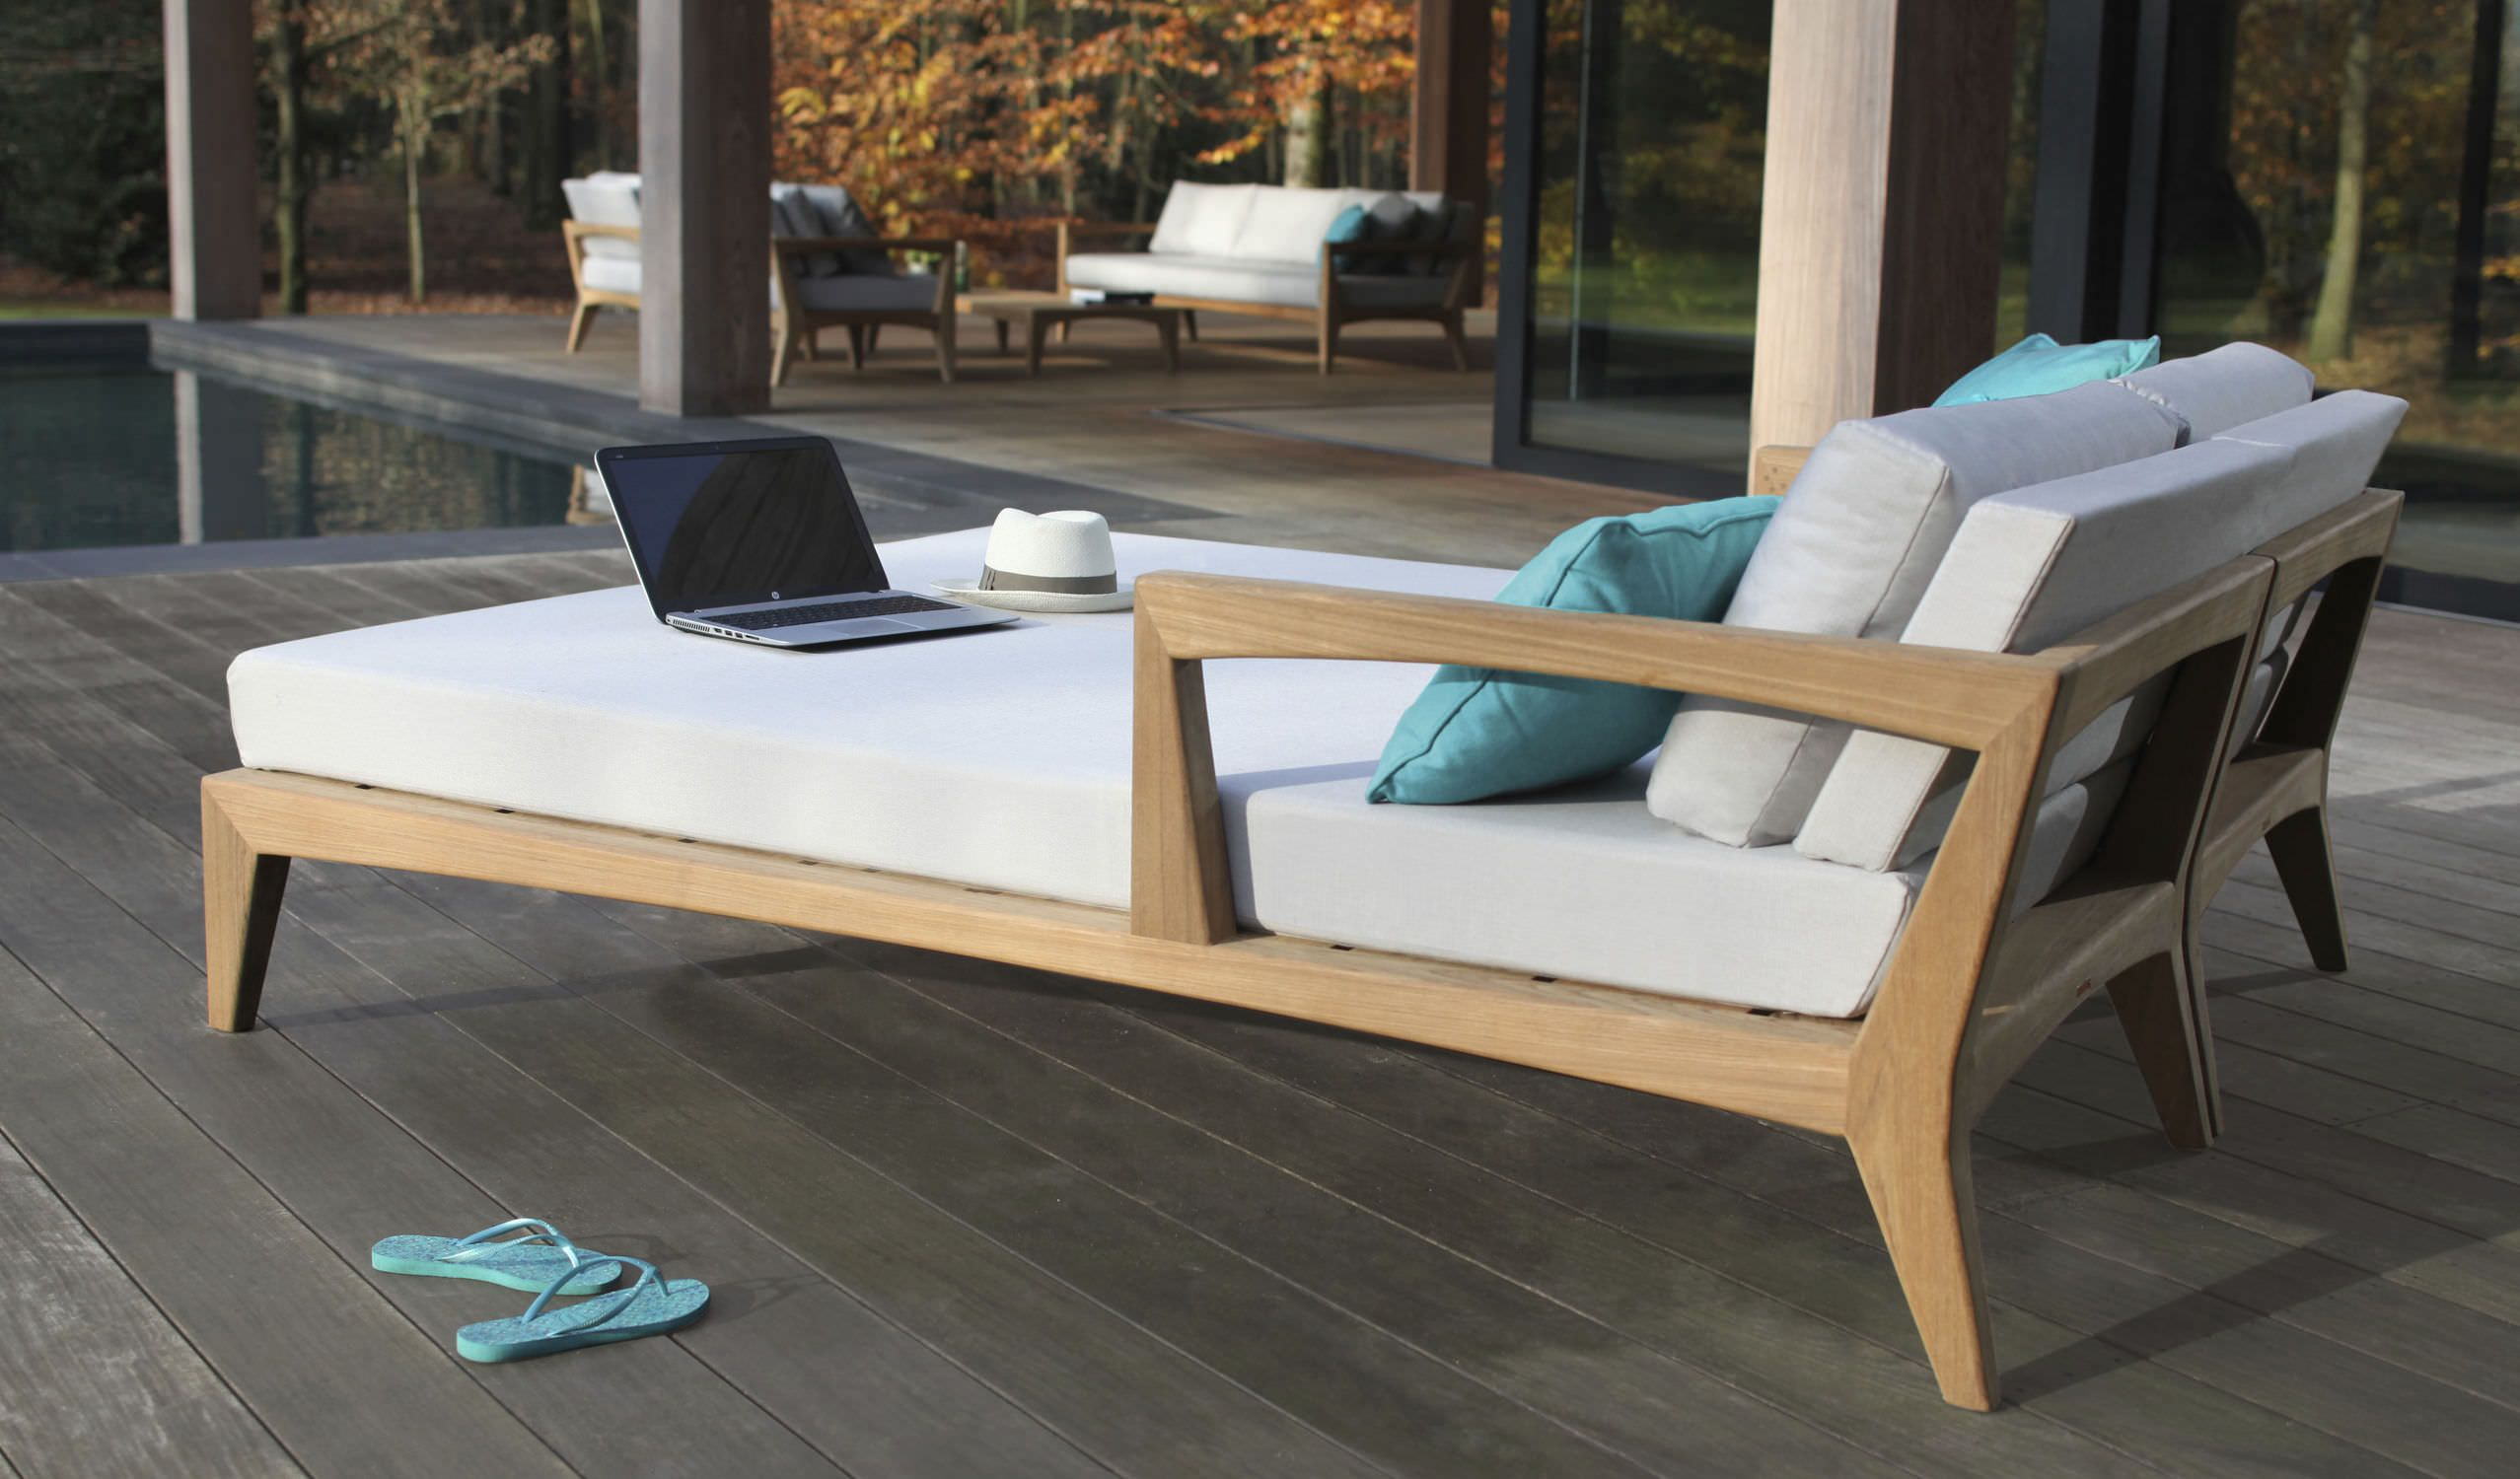 m ridienne contemporaine en teck de jardin zntl db by kris van puyvelde royal botania. Black Bedroom Furniture Sets. Home Design Ideas